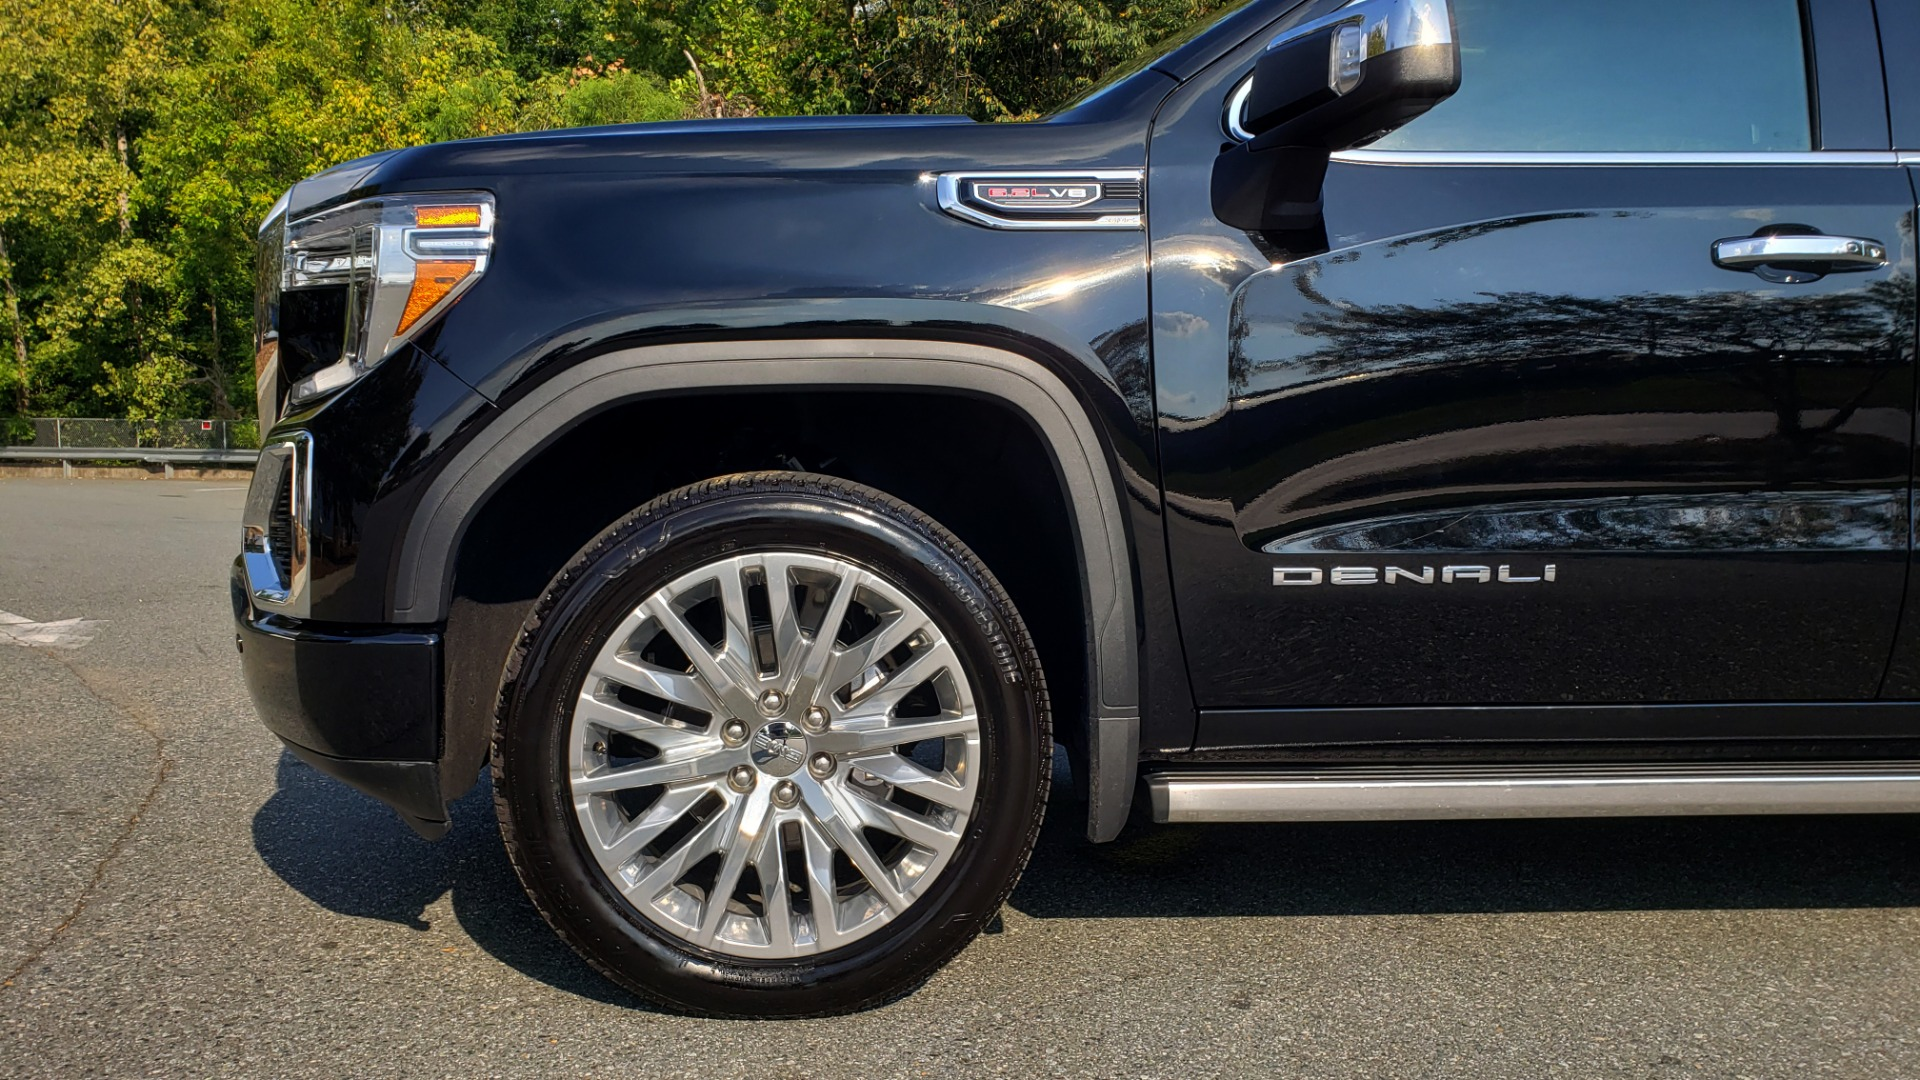 Used 2019 GMC SIERRA 1500 DENALI ULTIMATE 4WD / NAV / TECH PKG / DRVR ALRT for sale Sold at Formula Imports in Charlotte NC 28227 6